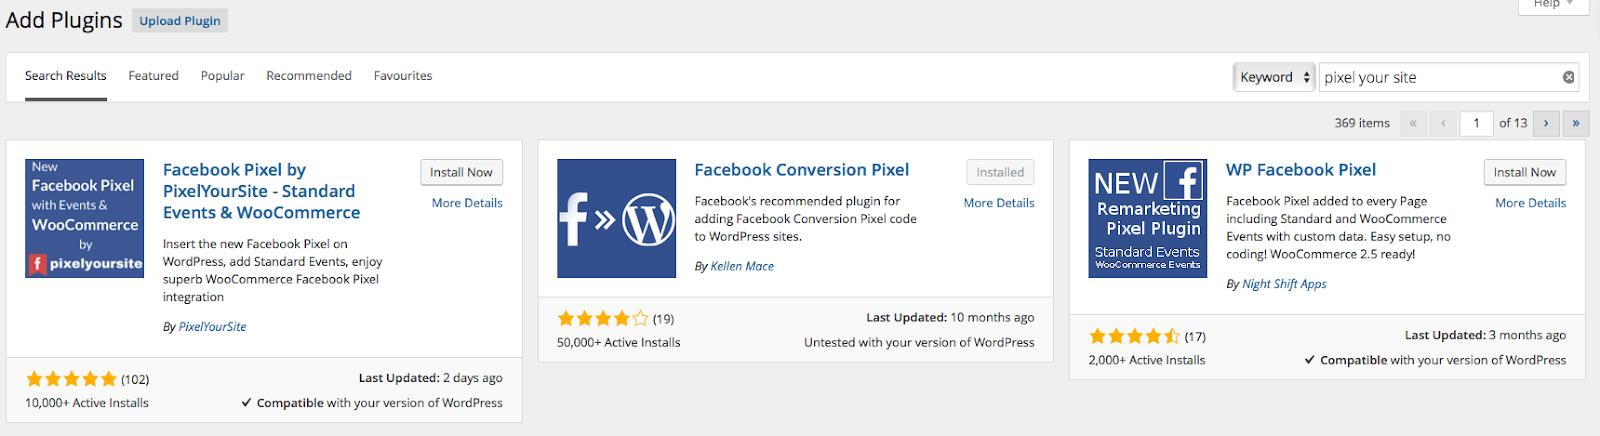 Pixel your site plugin